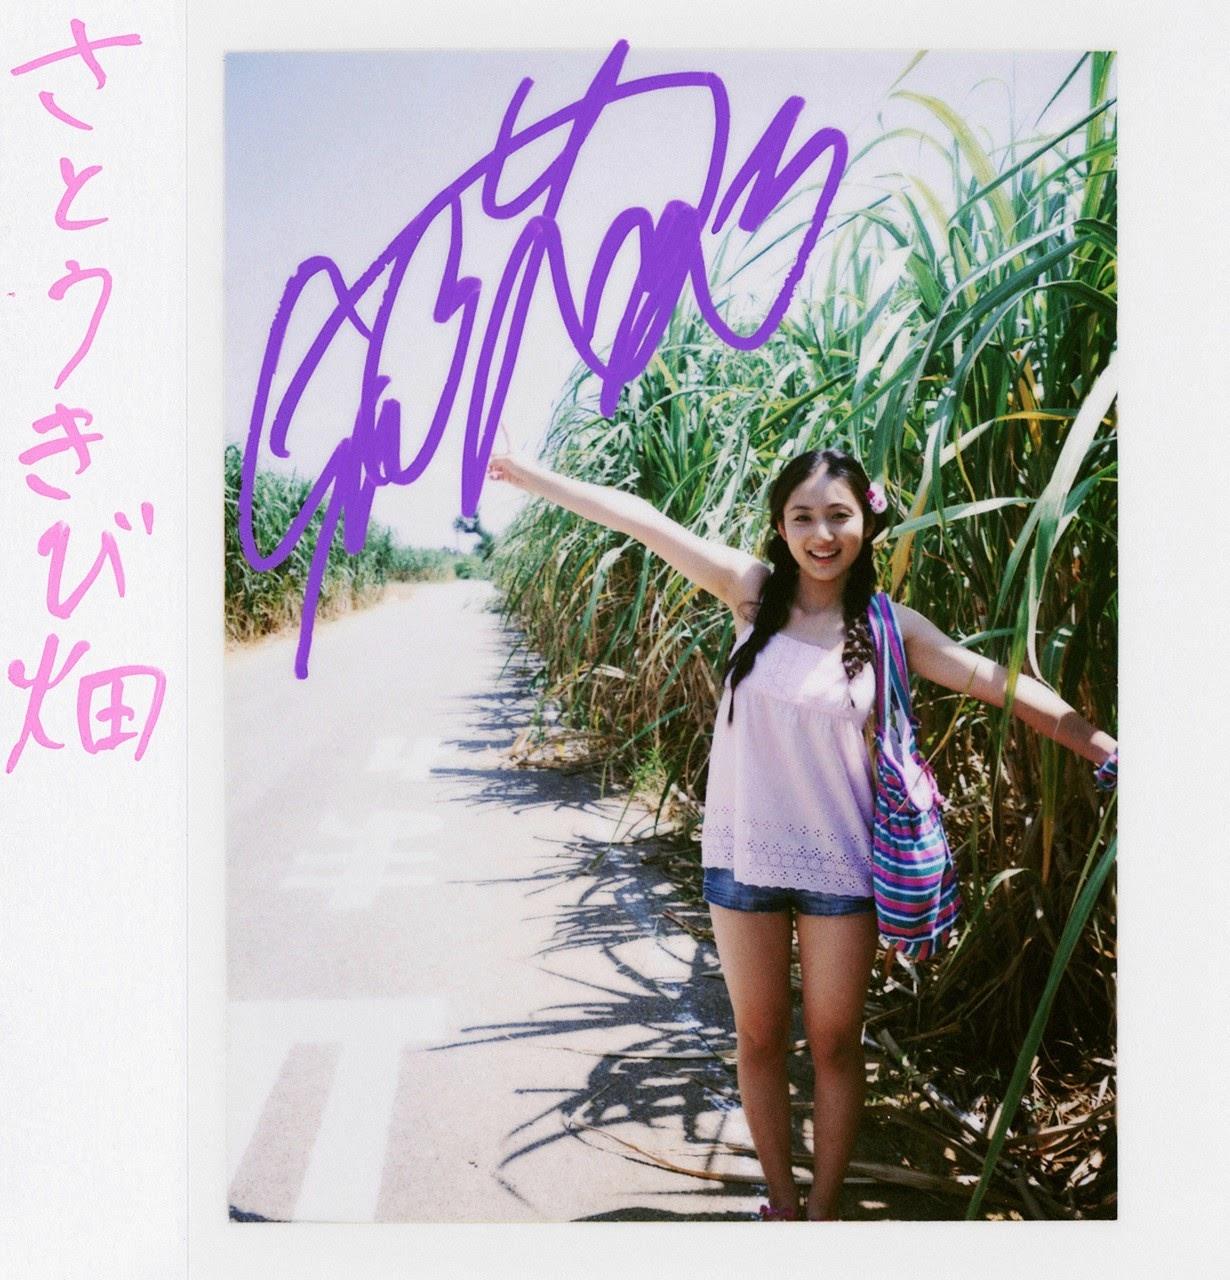 And on Kumejima the first experienceher late summer vacation begins! Saaya127